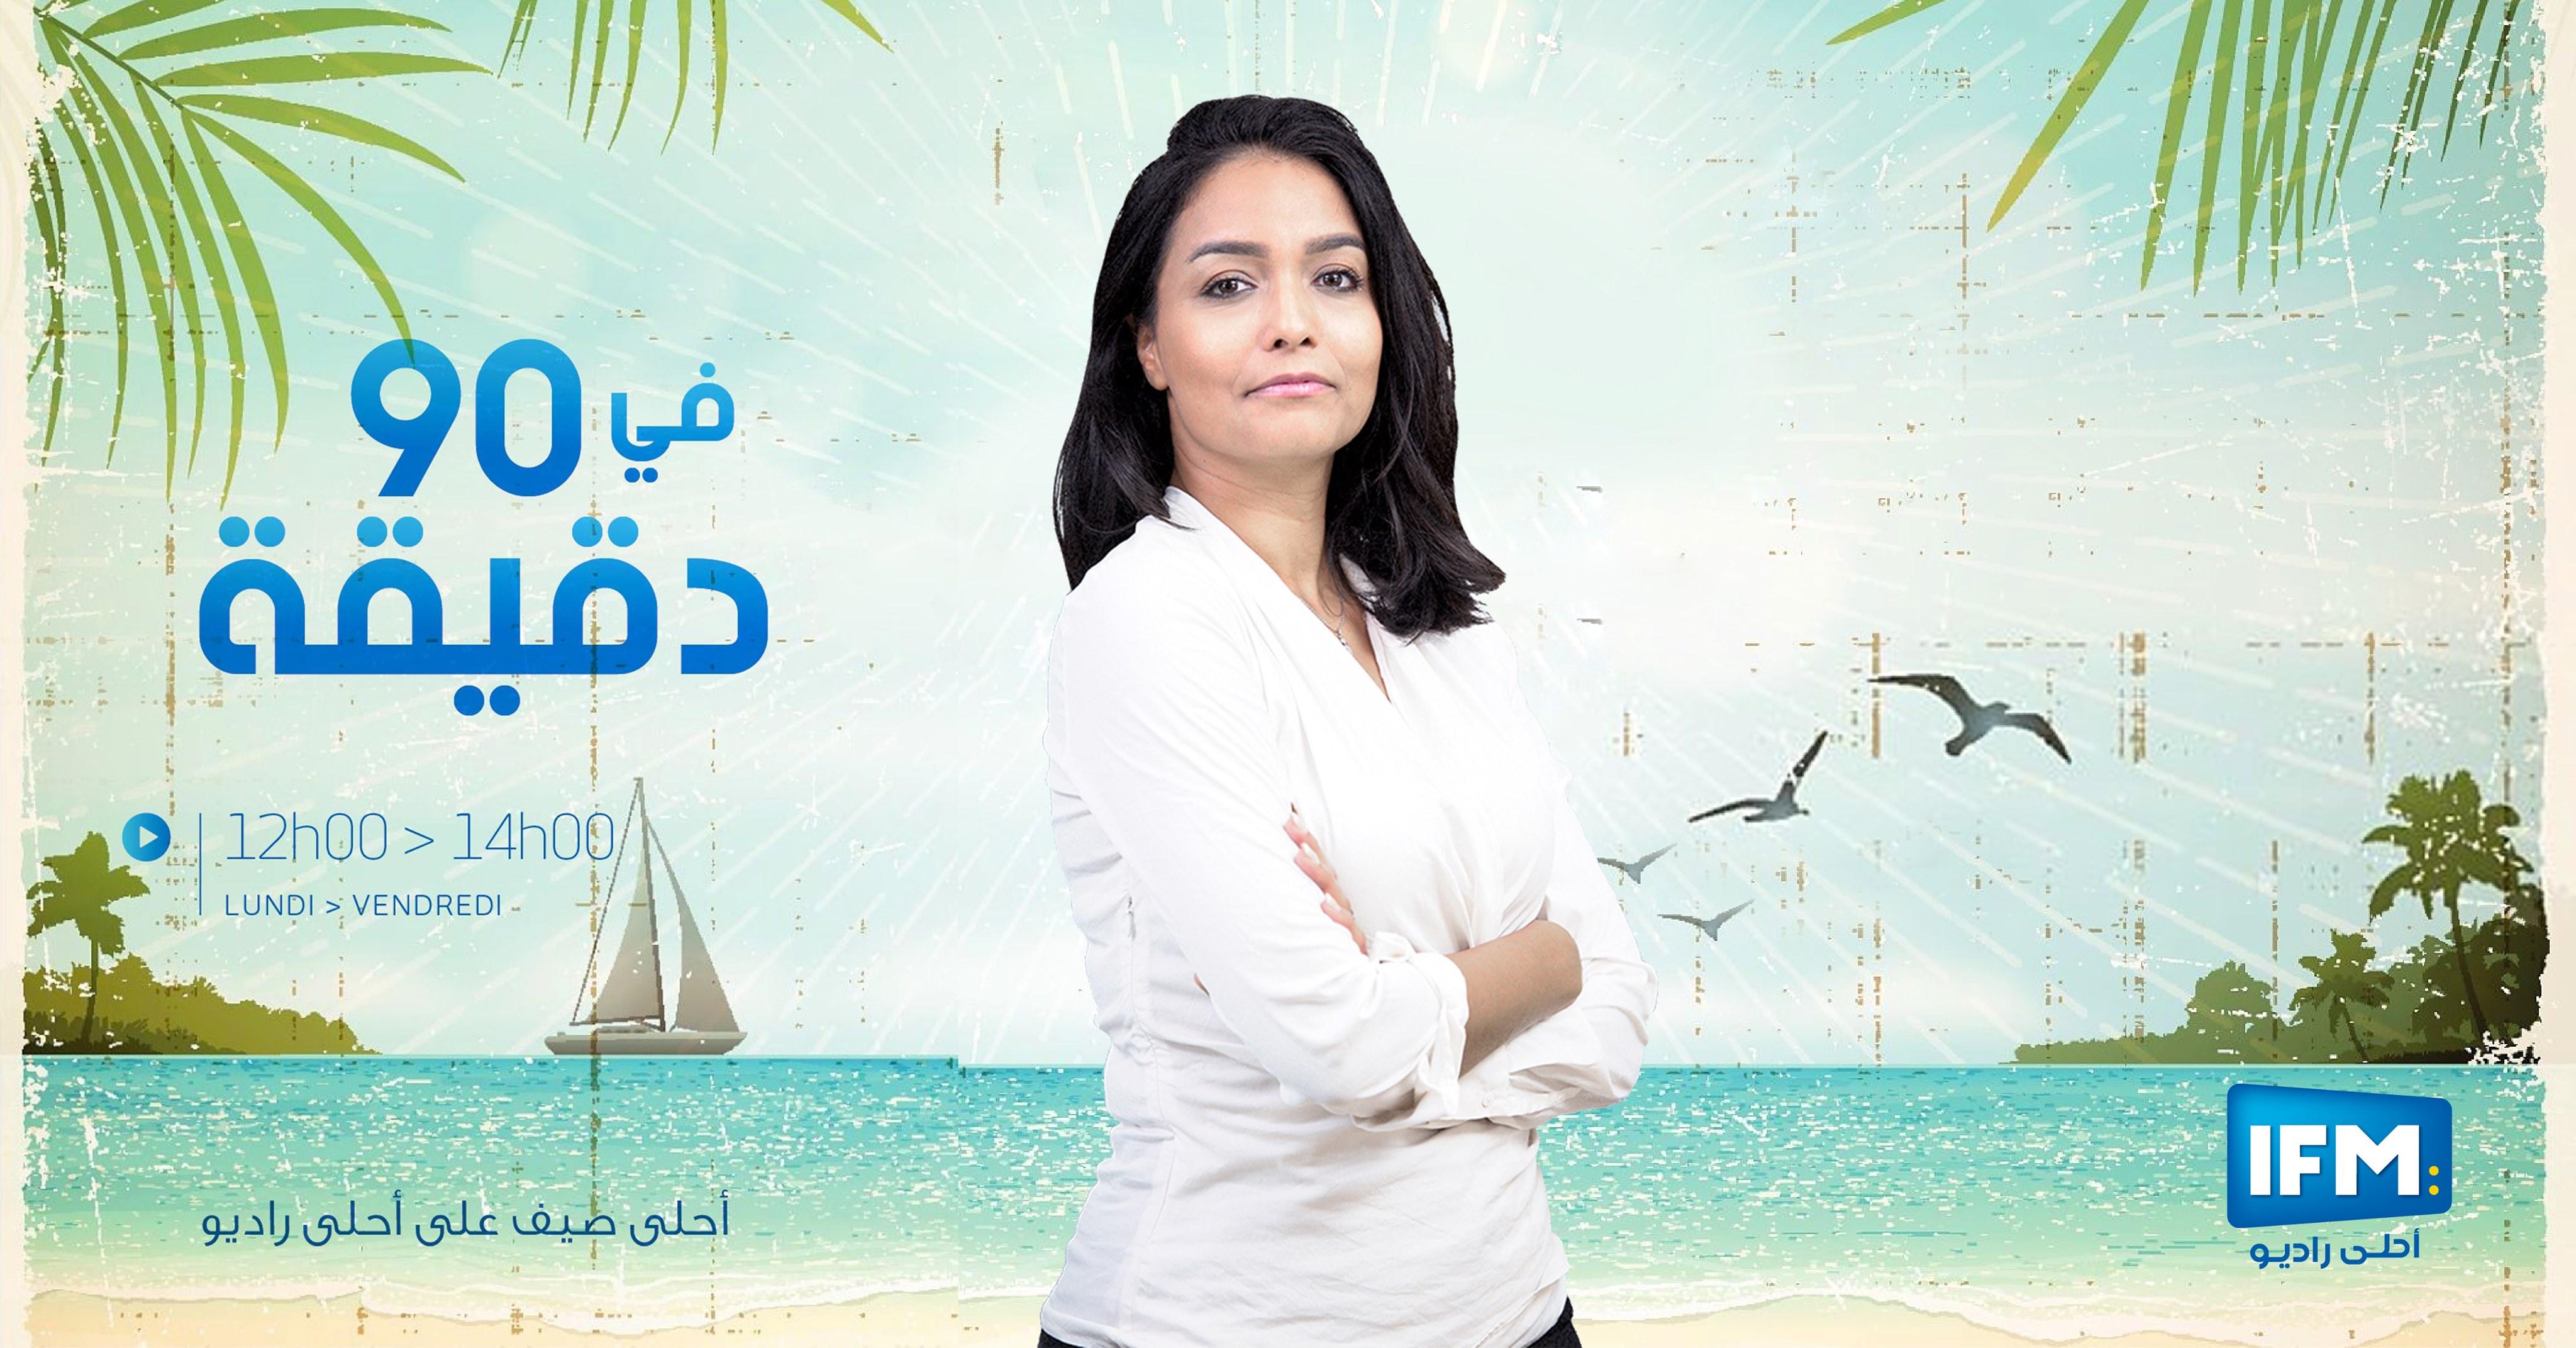 90 Dkika du Jeudi 10 Septembre 2020 avec Khouloud Mabrouk 90 D9i9a